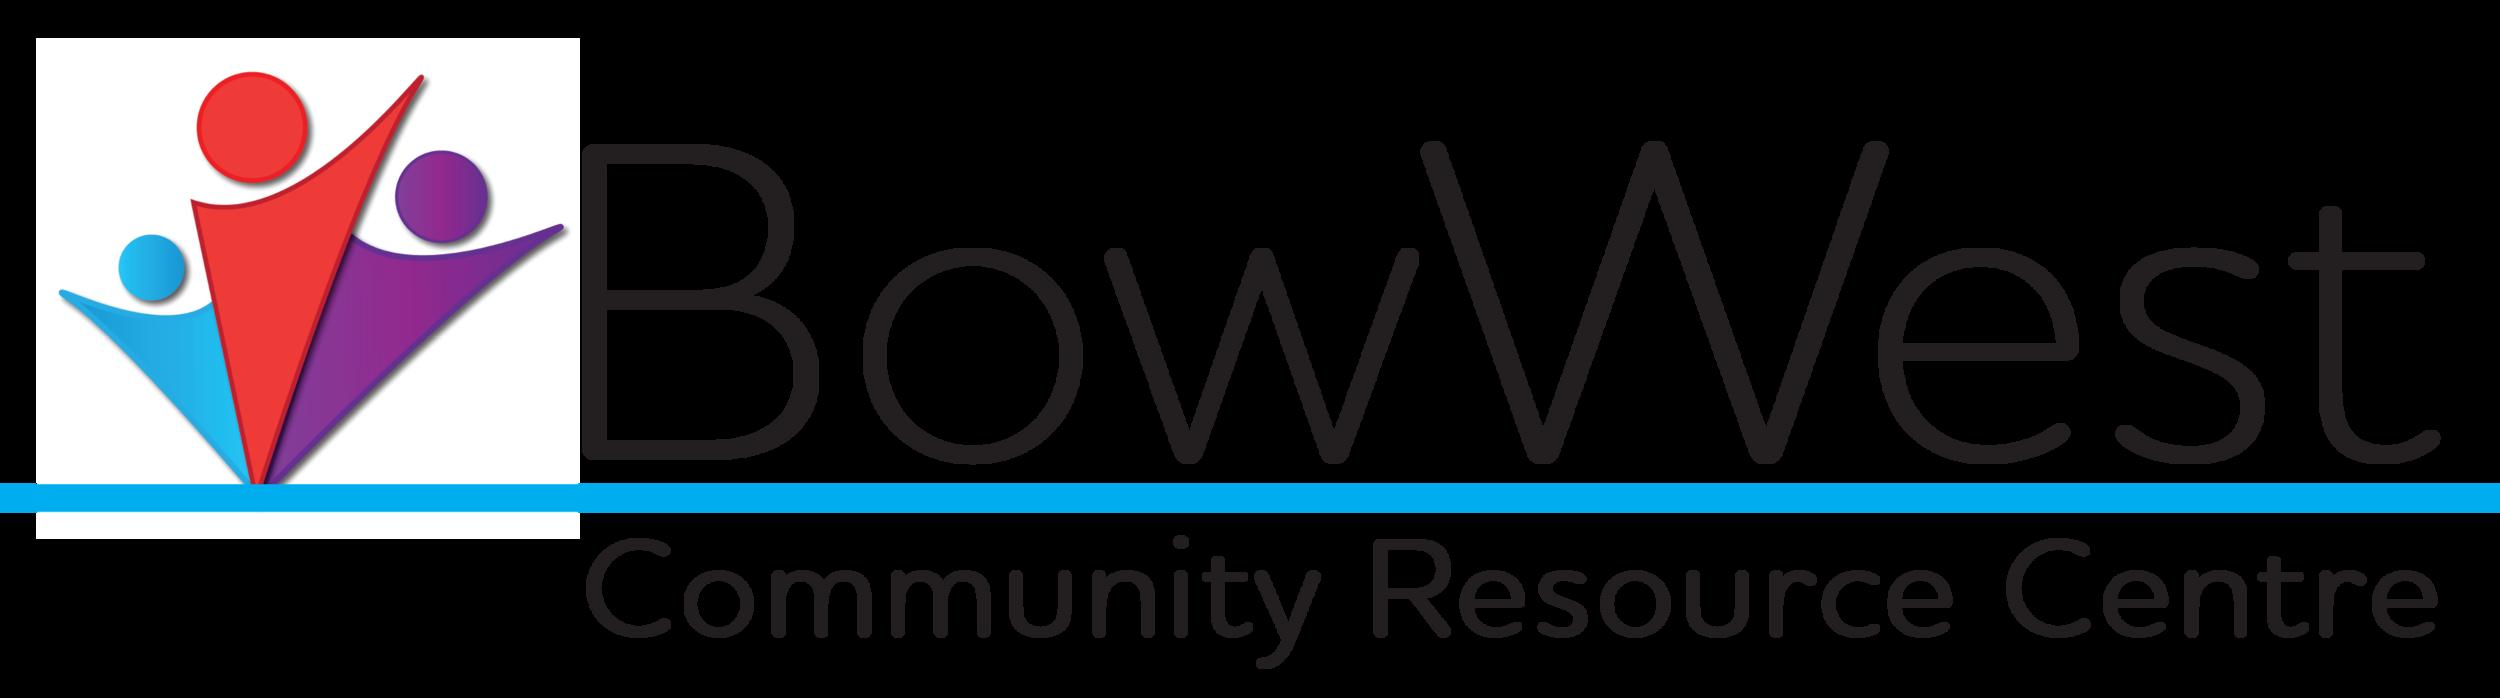 BOWWEST LOGO CRC JULY 31 2018.png